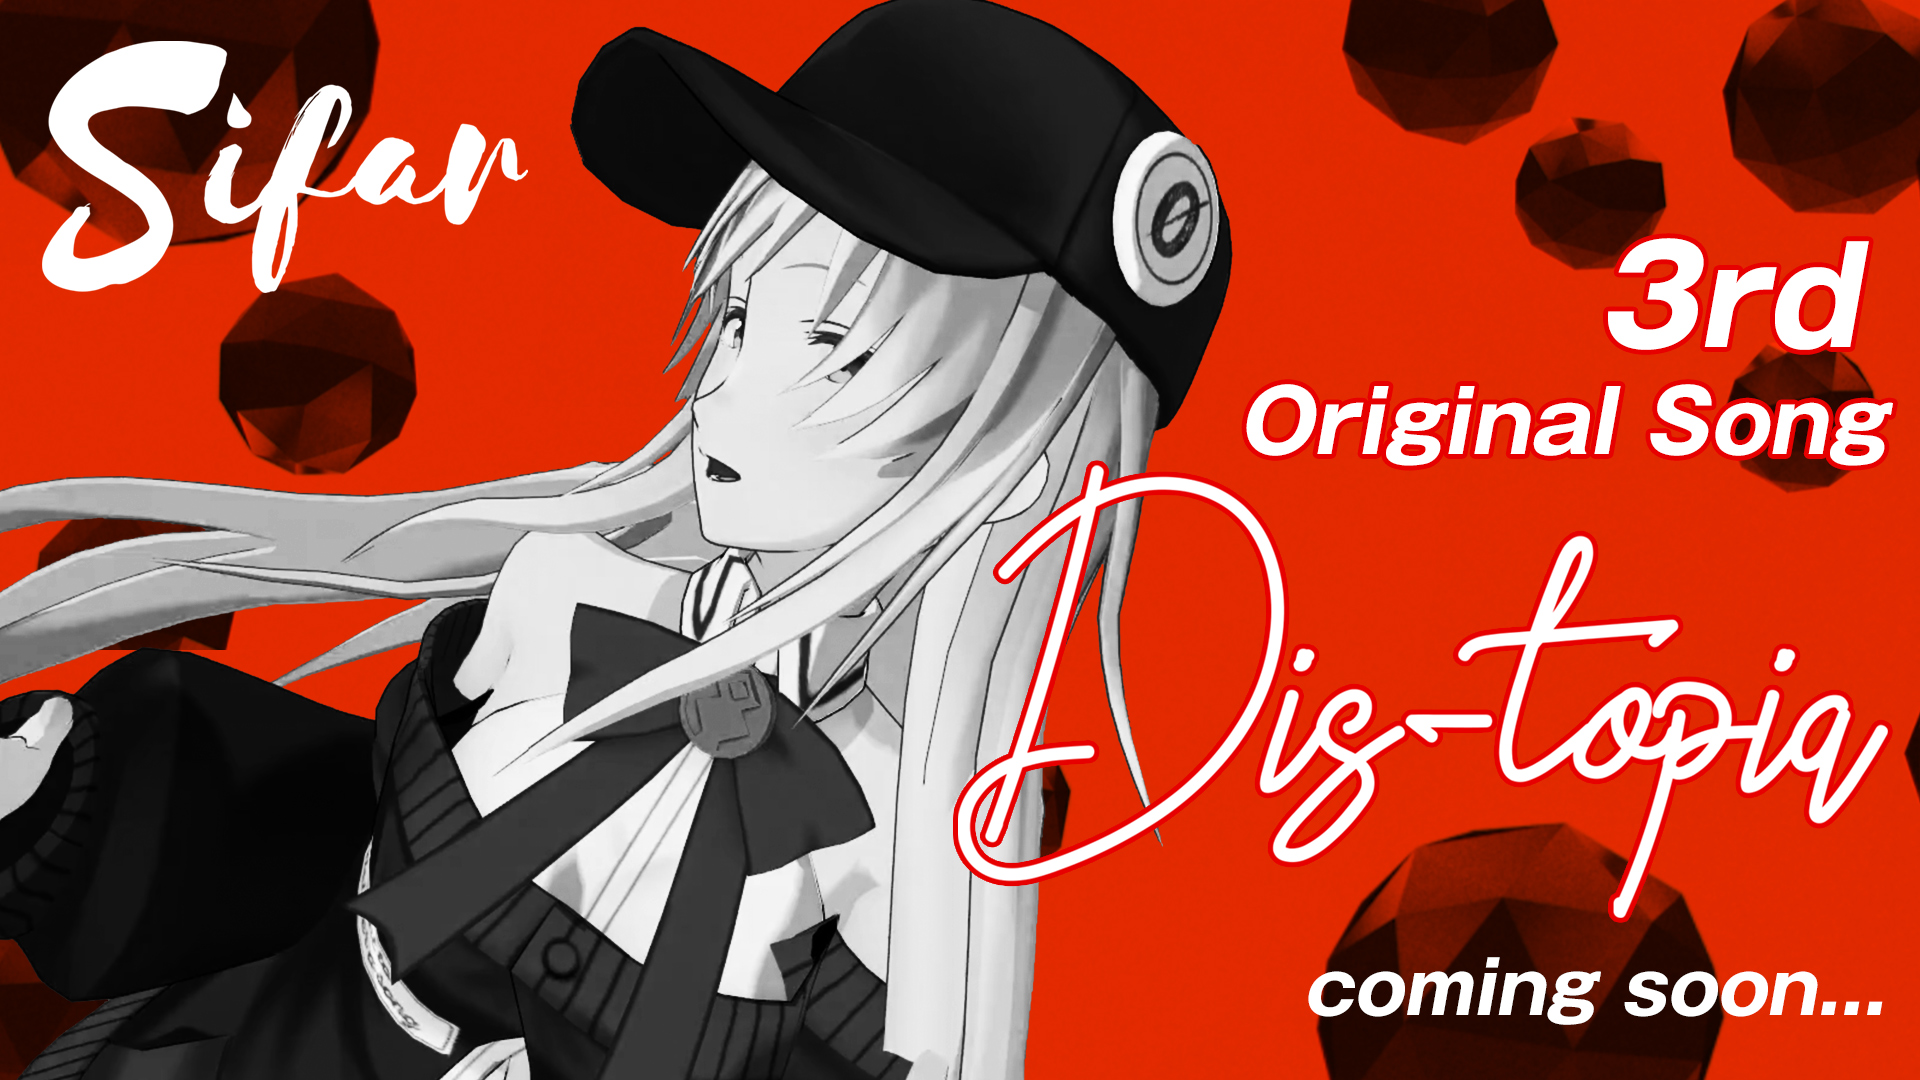 VSinger / Sifar  3rdシングル「Dis-topia」楽曲&MVを制作!